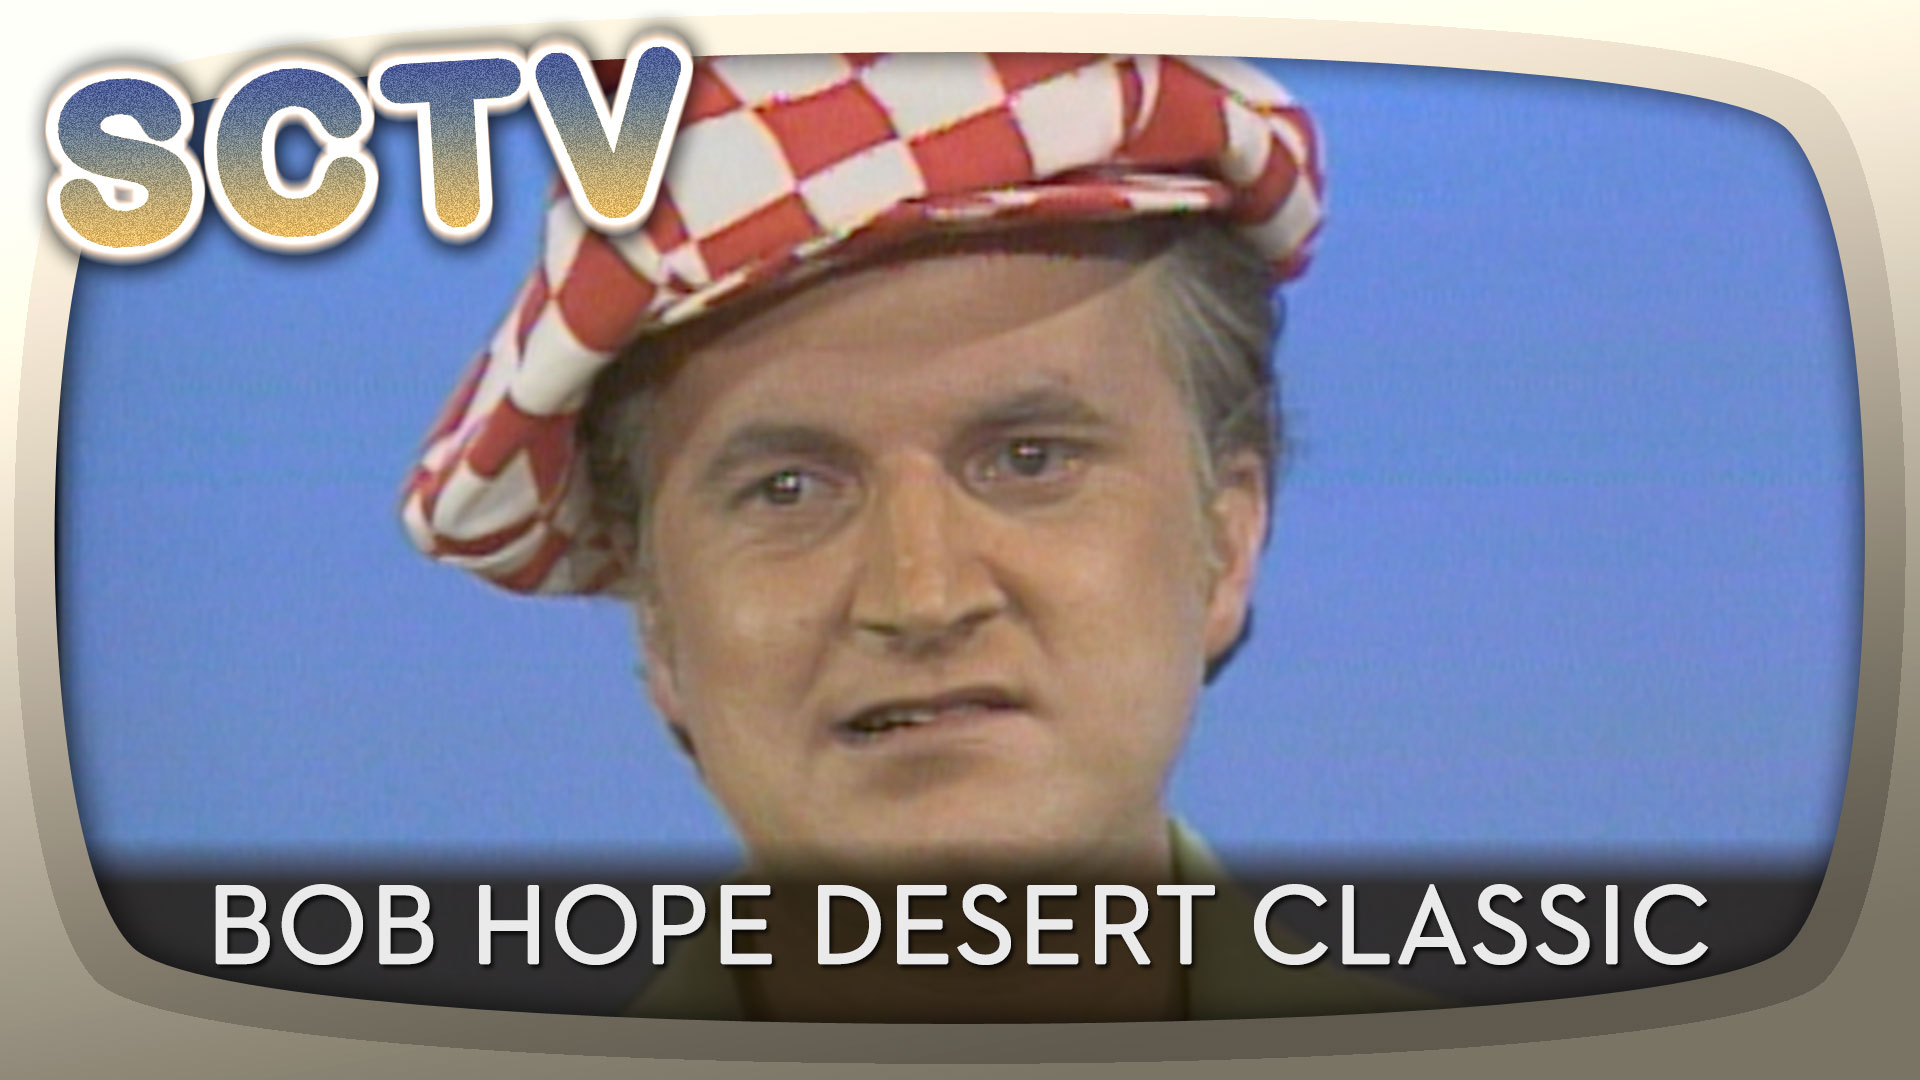 SCTV – Bob Hope Desert Classic